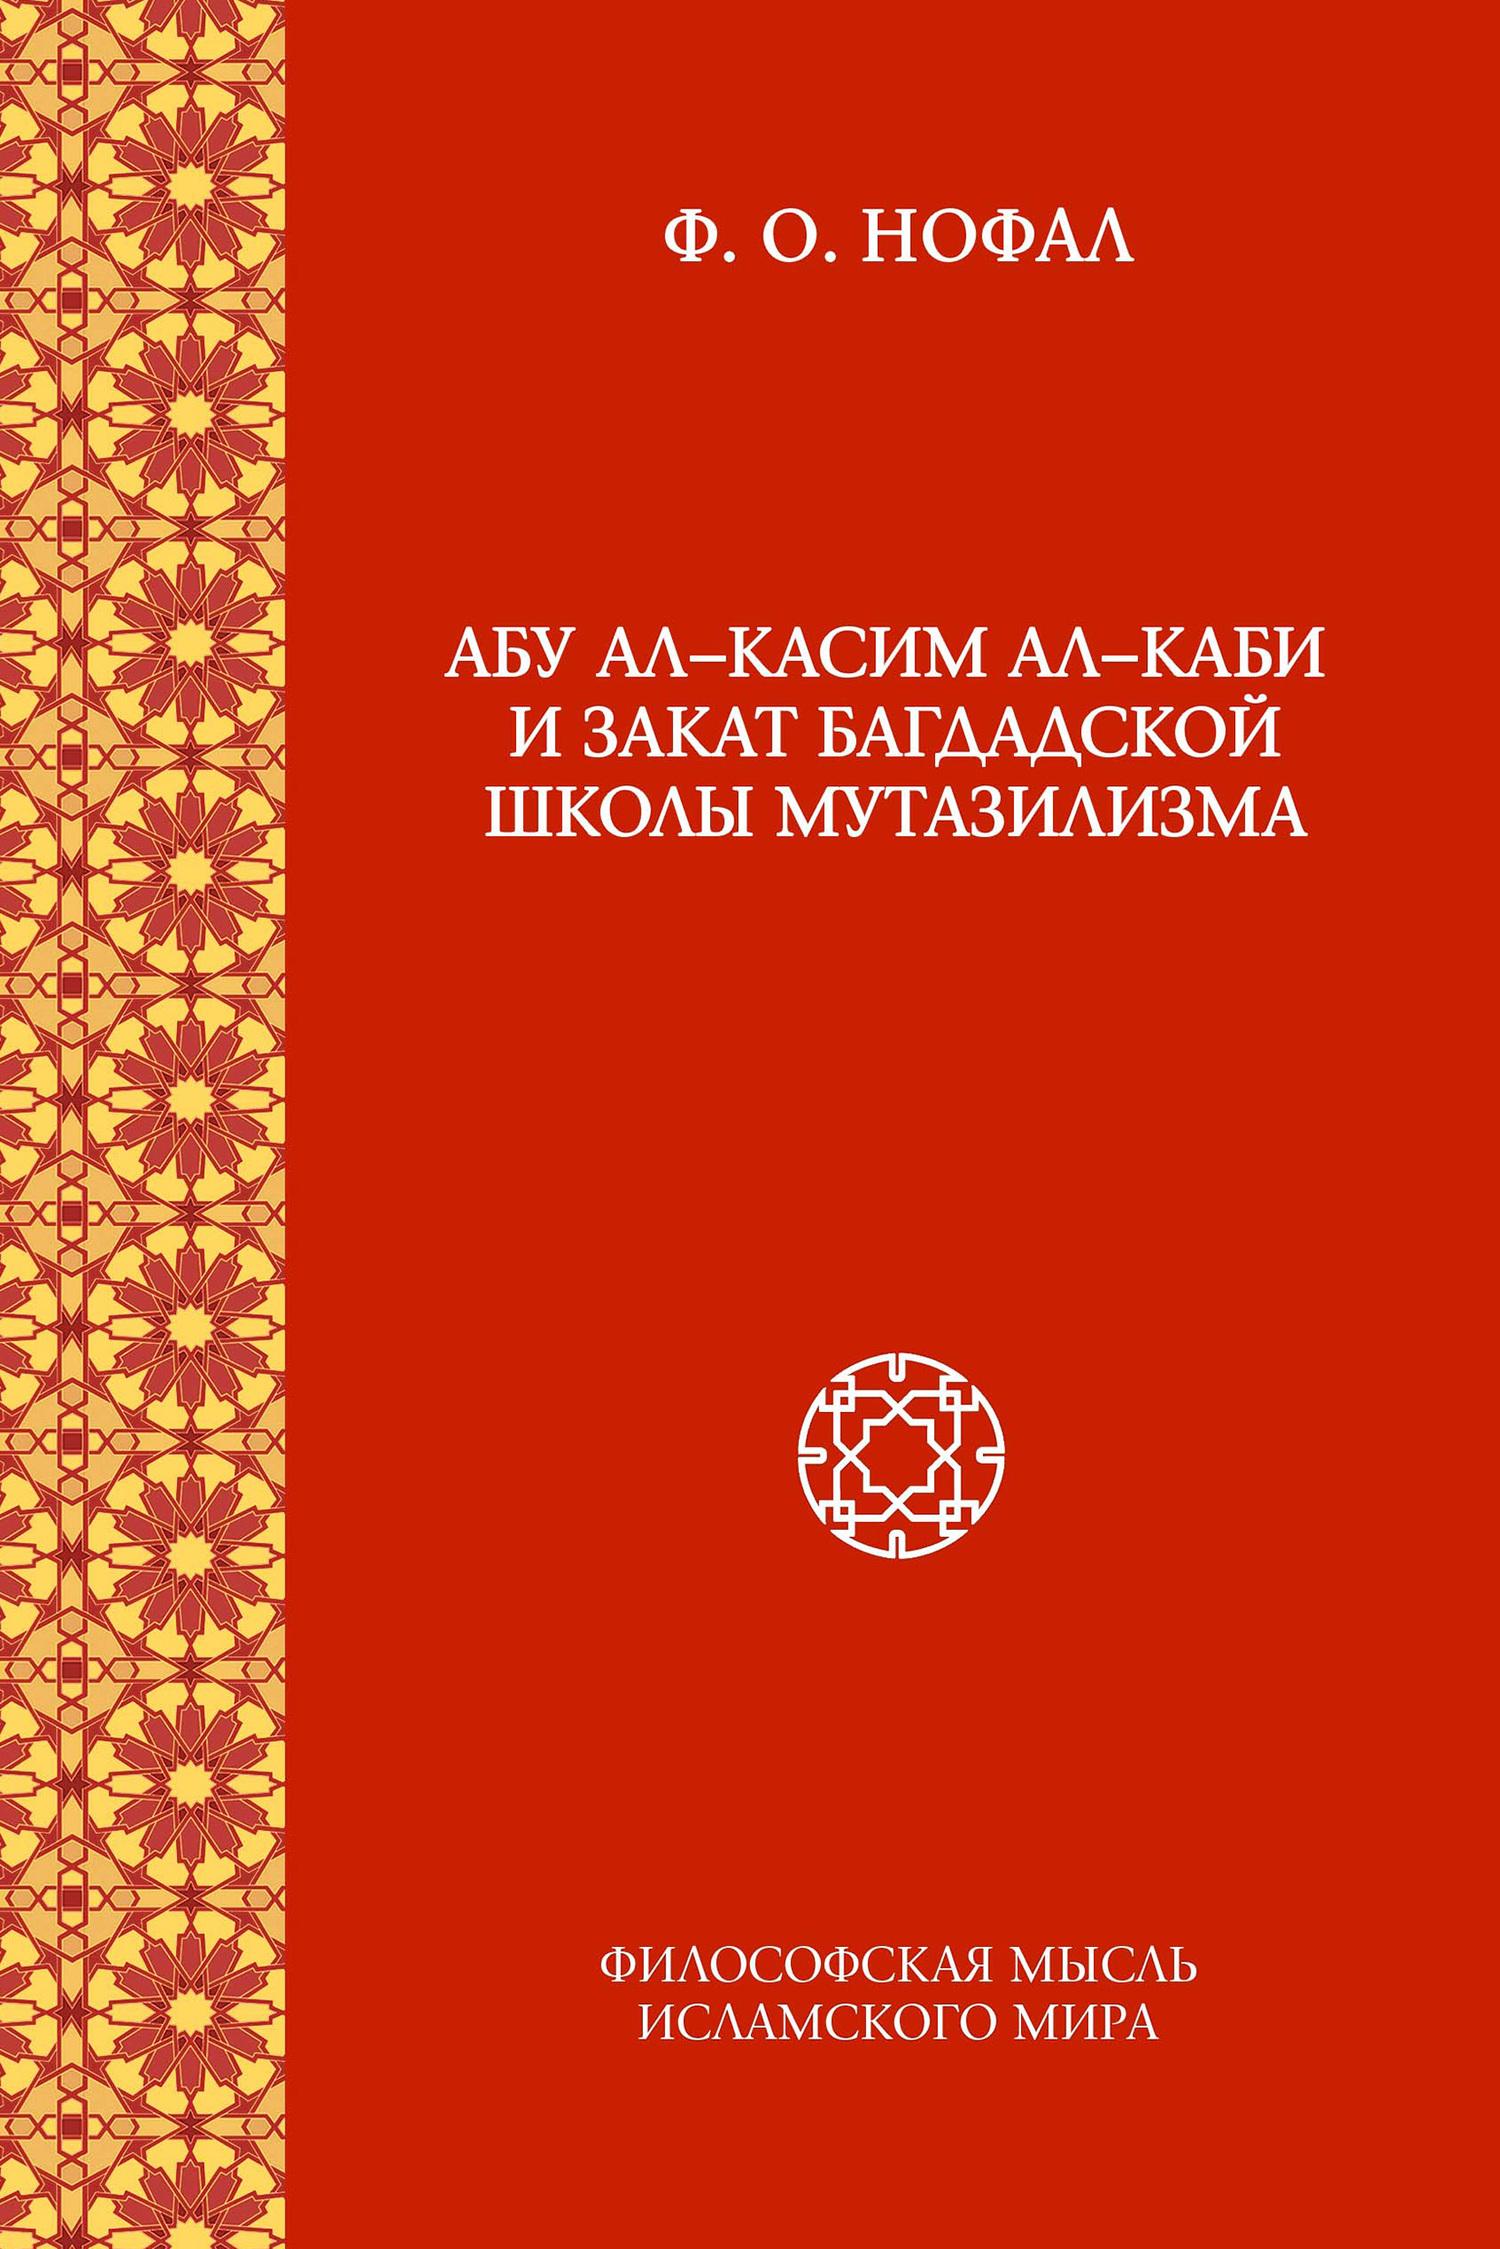 Коллектив авторов. Абу ал-Касим ал-Каби и закат багдадской школы мутазилизма